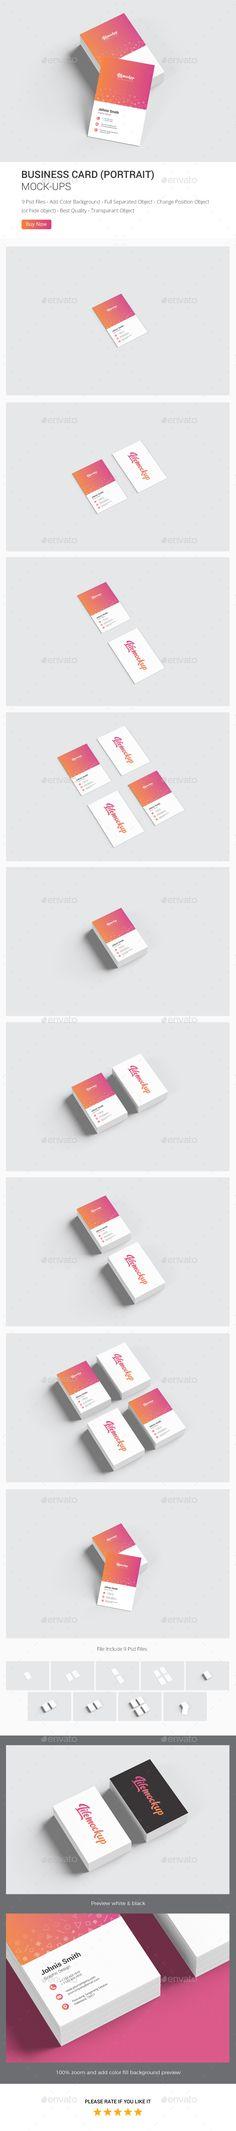 Business Card Portrait Mockup - Business Cards Print